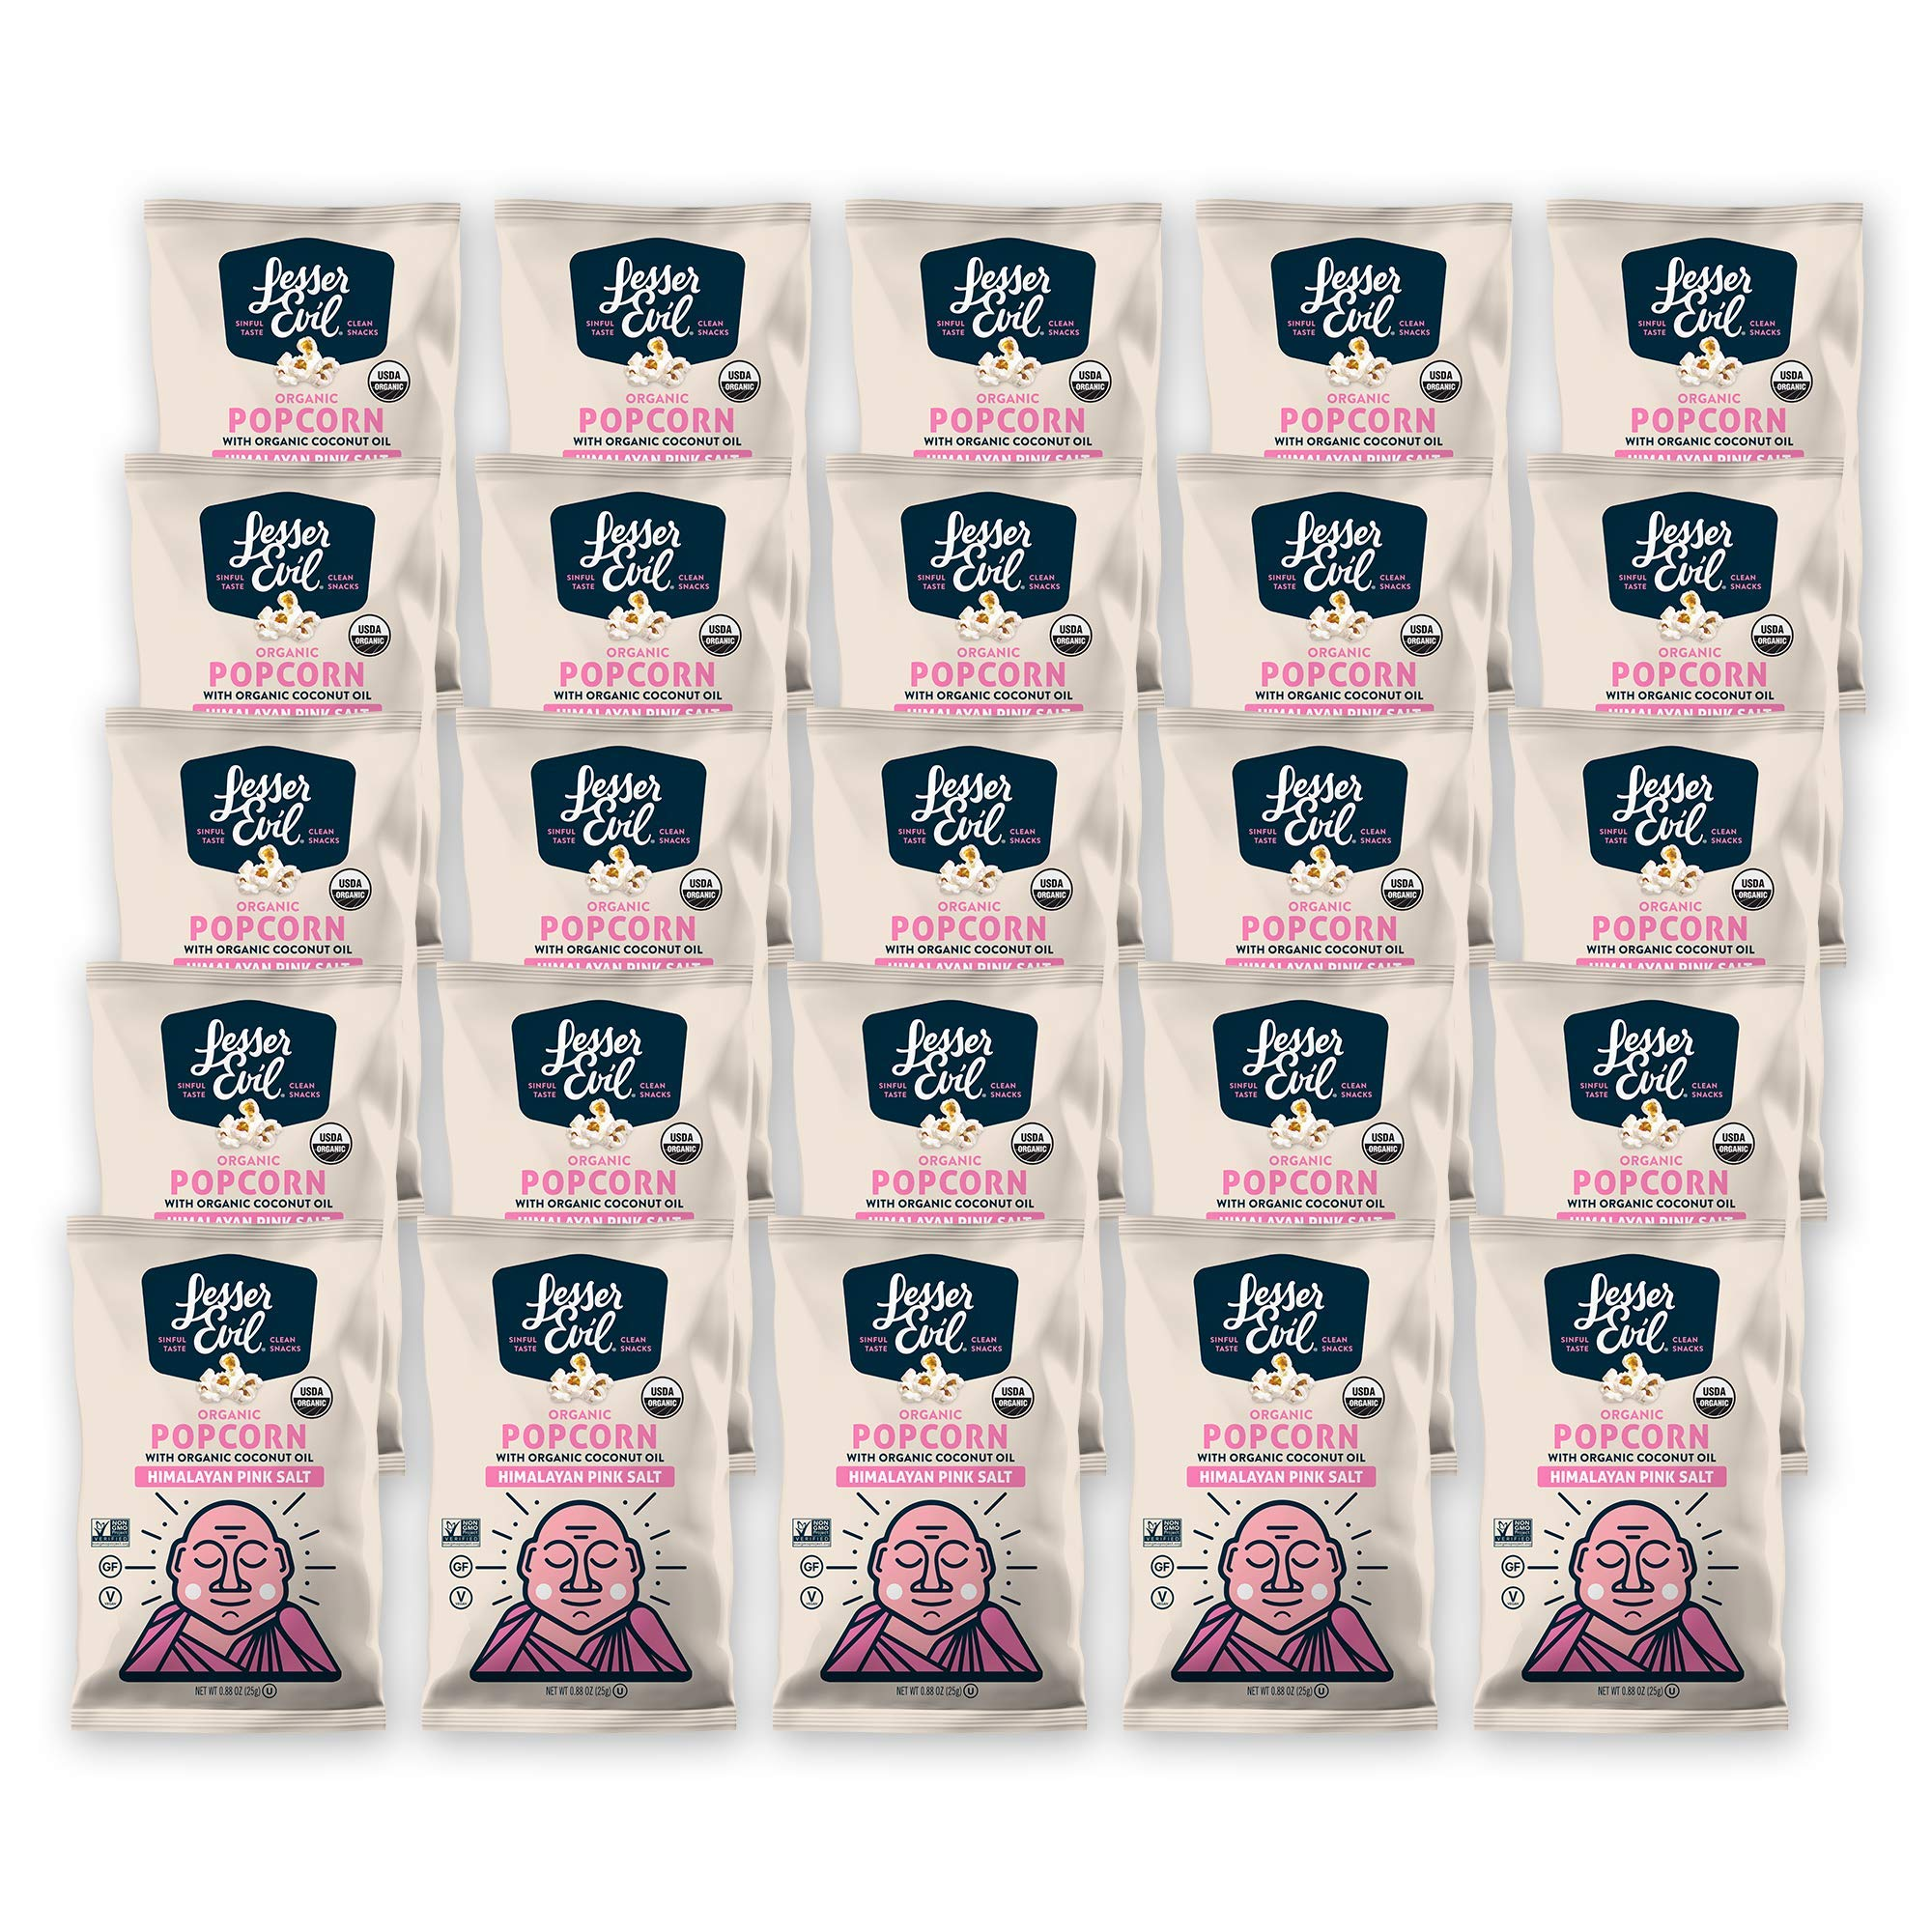 Lesserevil Himalayan Pink Salt Organic Popcorn, 0.88 Ounce (25 Count)